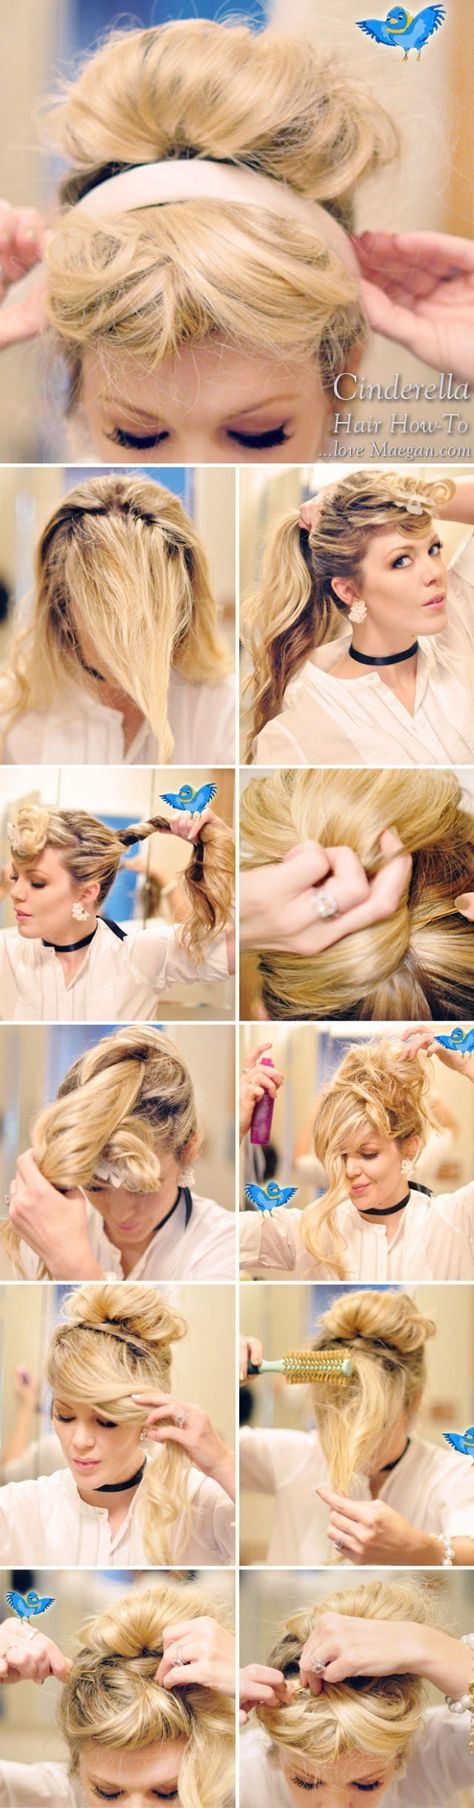 Cinderella's chic updo | Community Post: 7 Easy Hair Tutorials Even Disney Princesses Would Envy